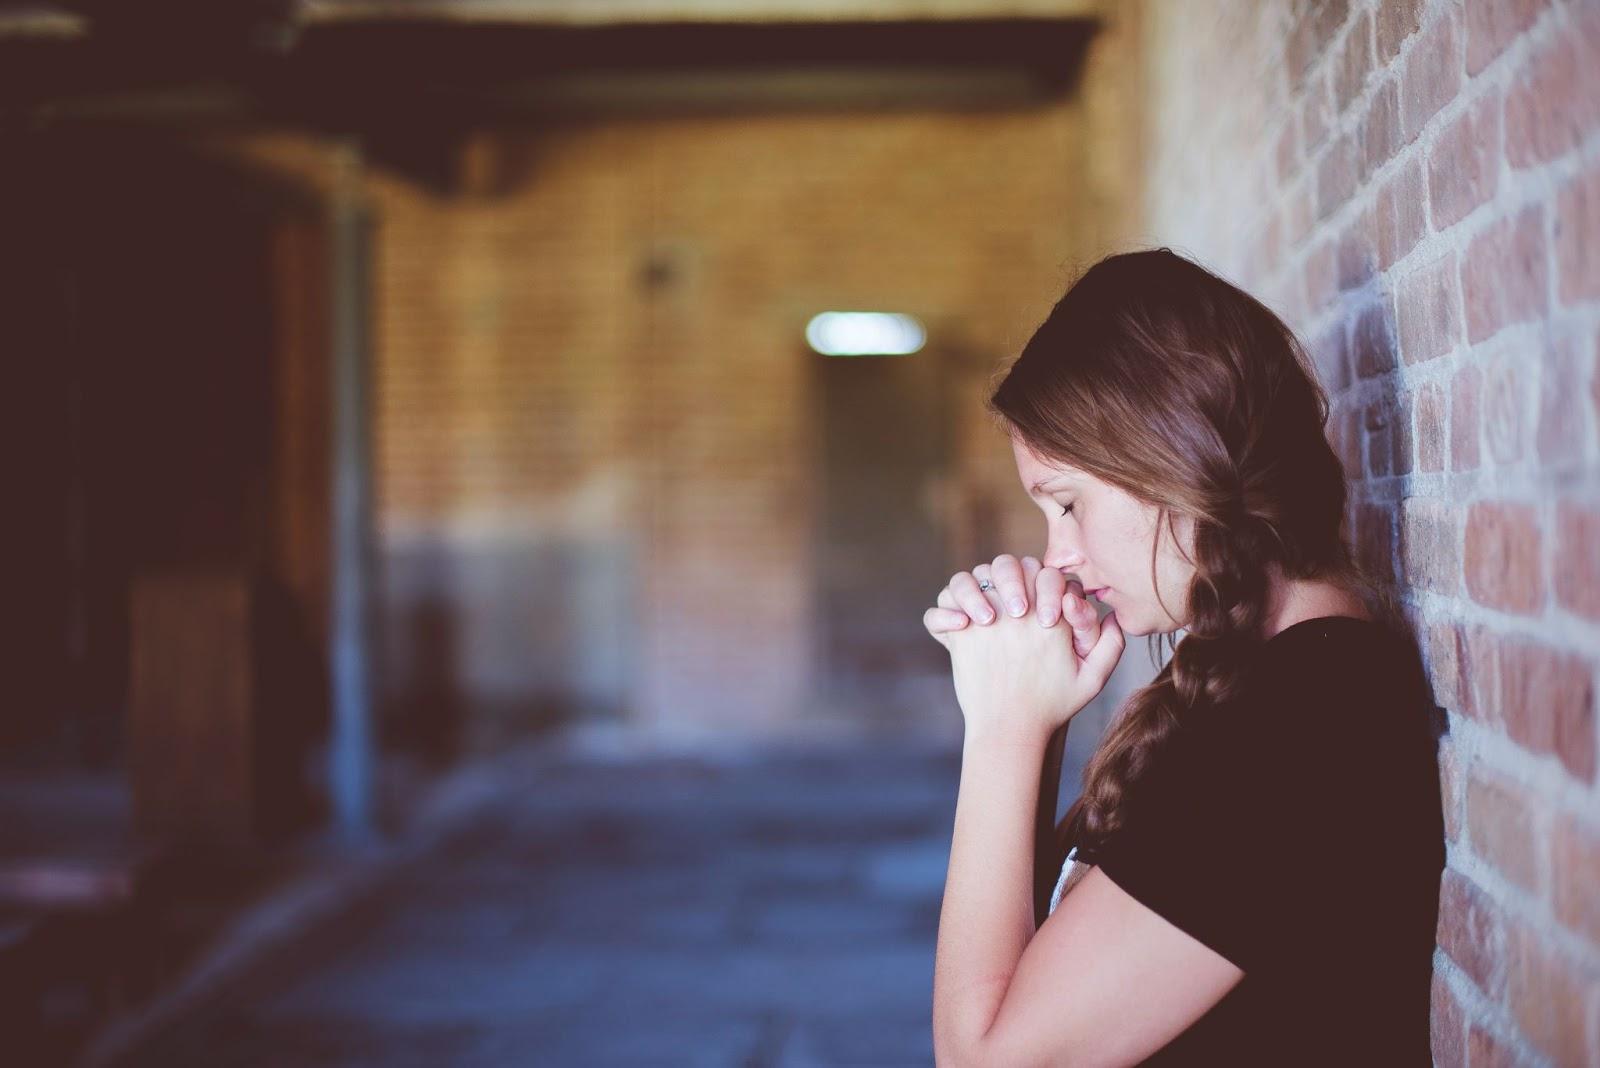 Woman praying against a brick wall